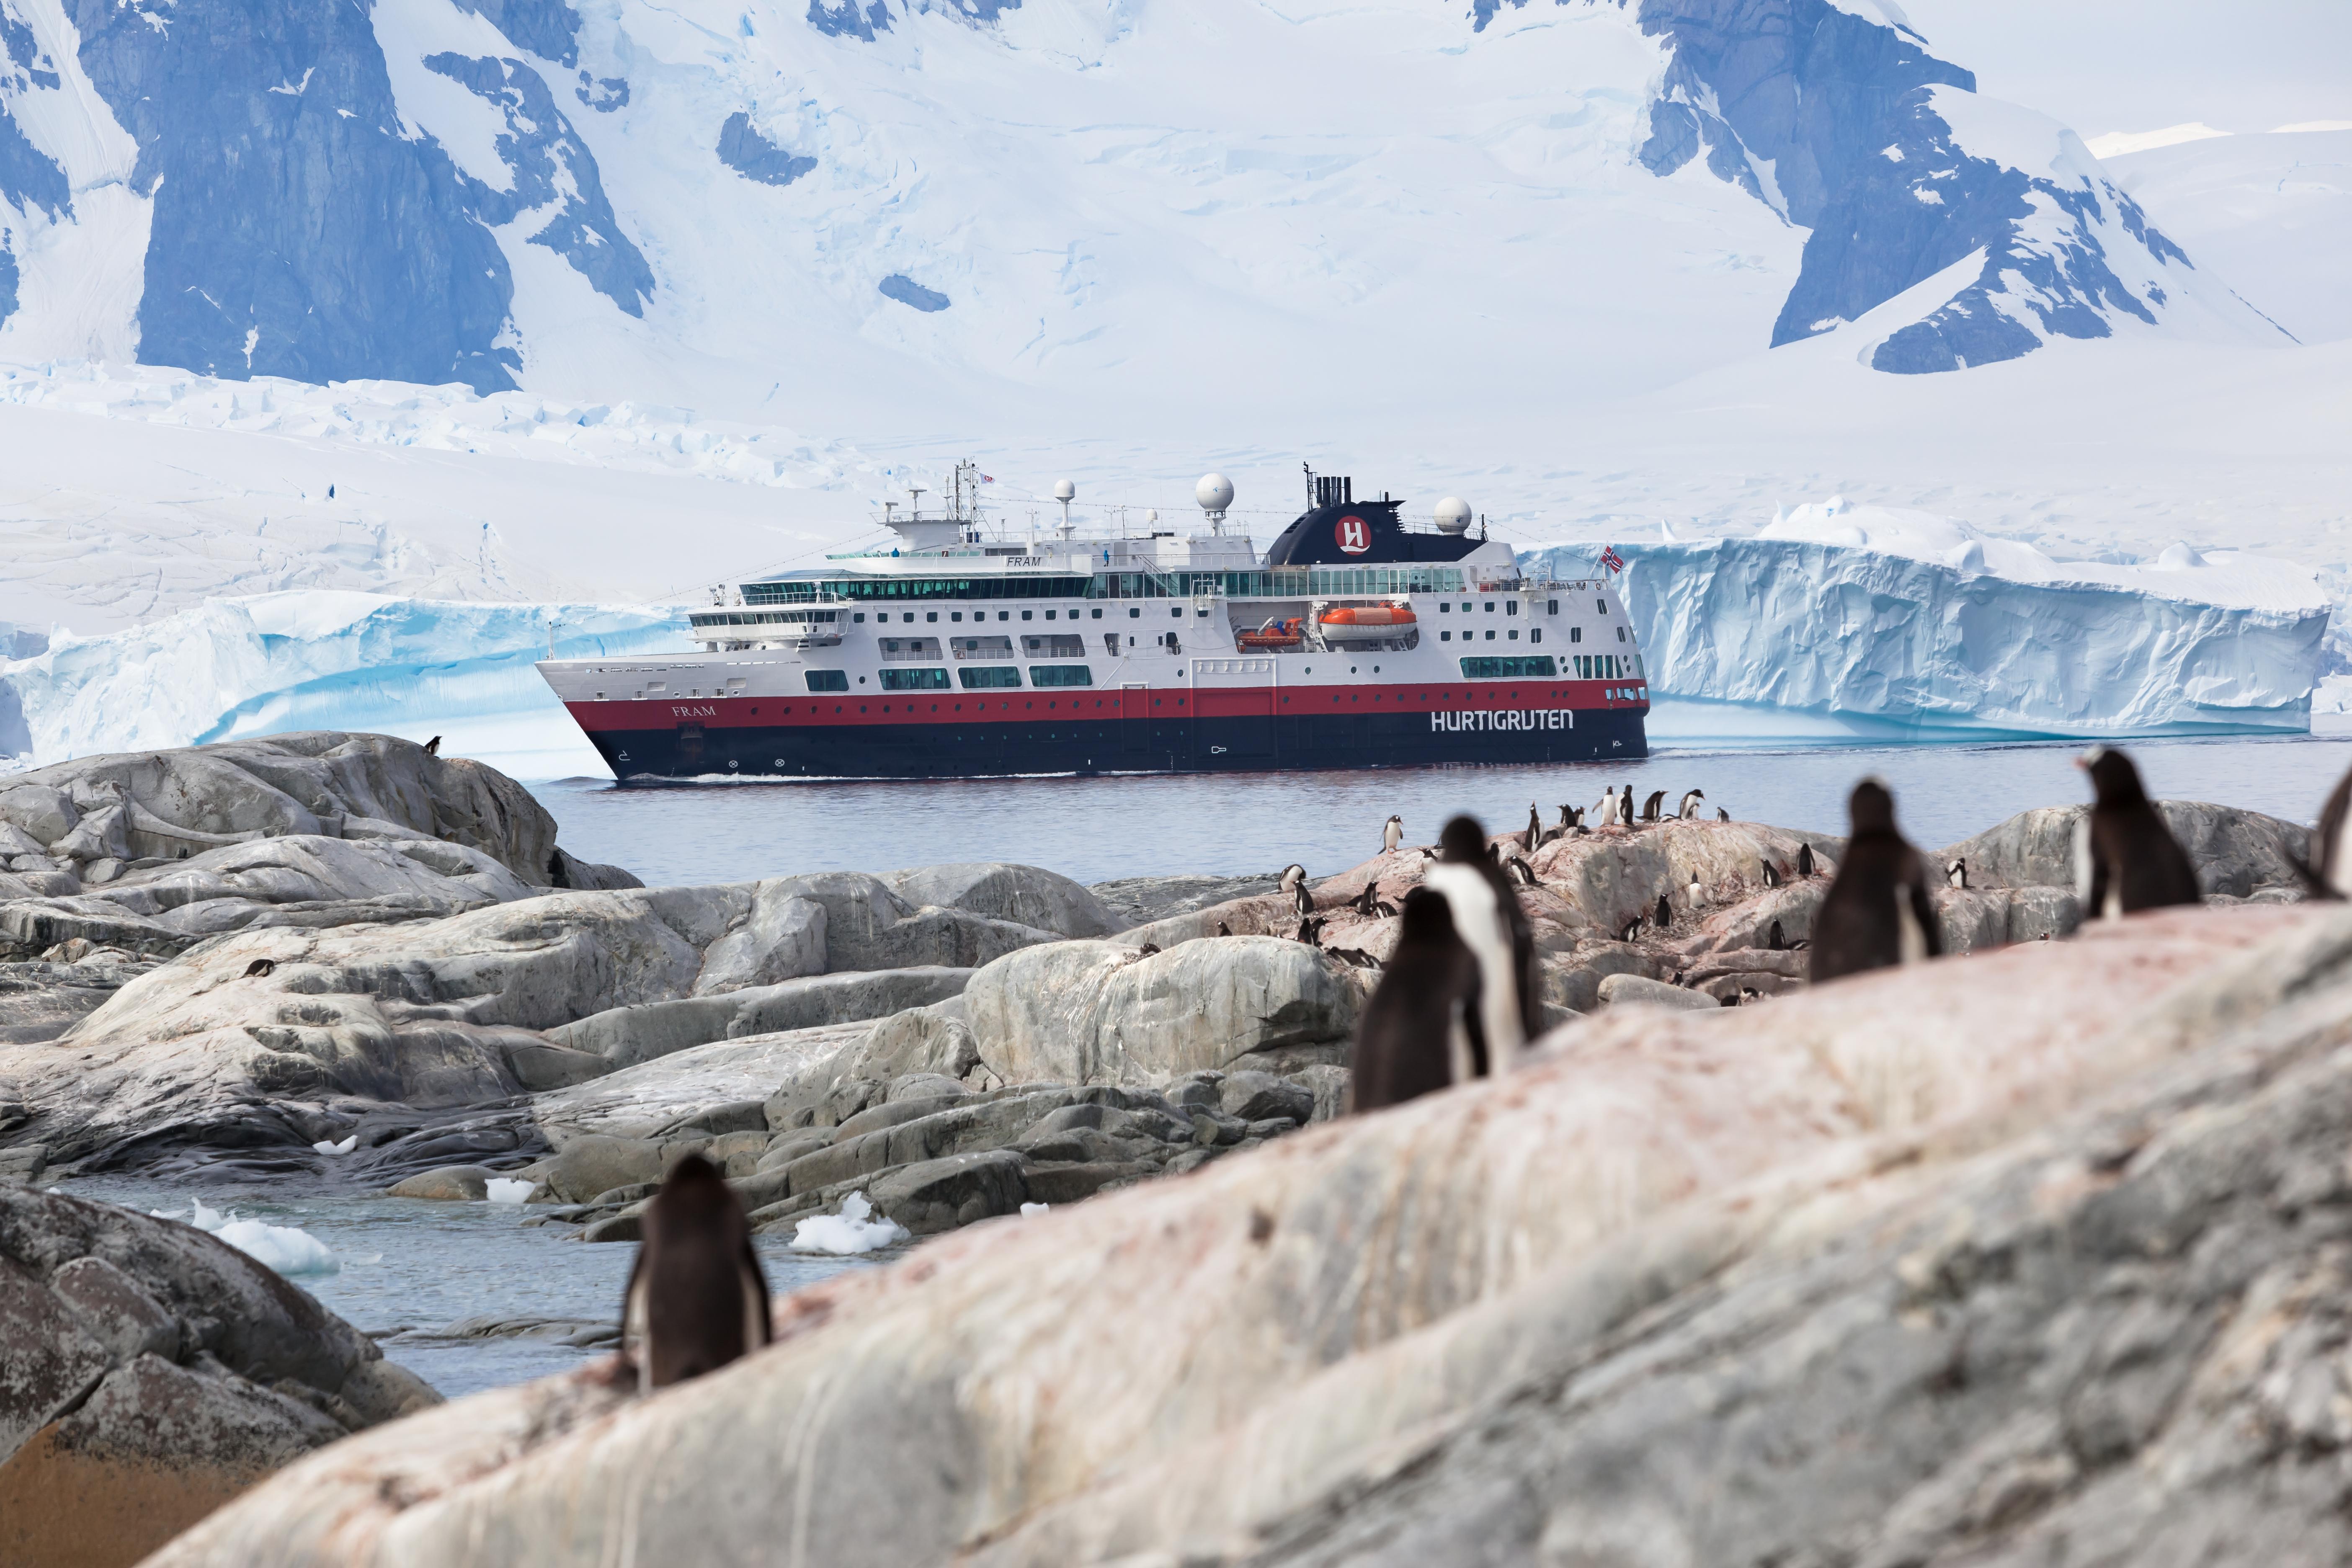 Antarctic Peninsula cruise ship Hurtigruten